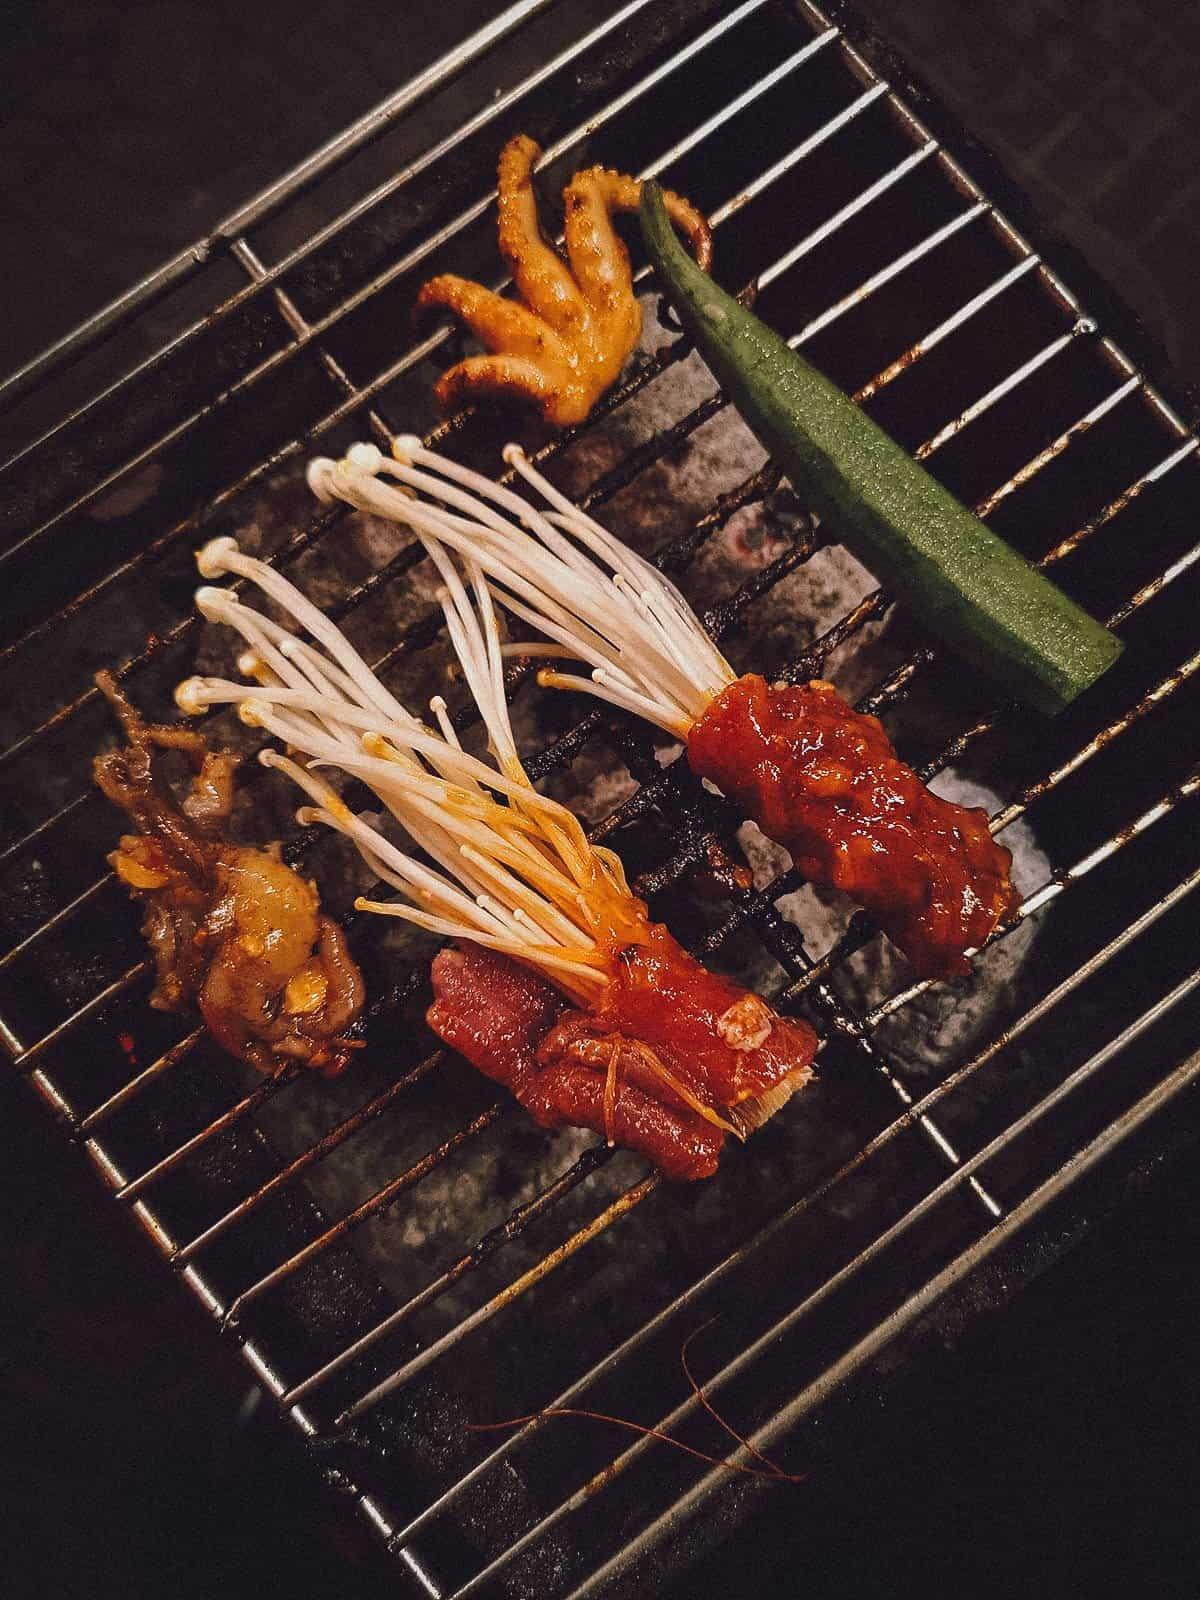 BBQ at Moi in Hoi An, Vietnam